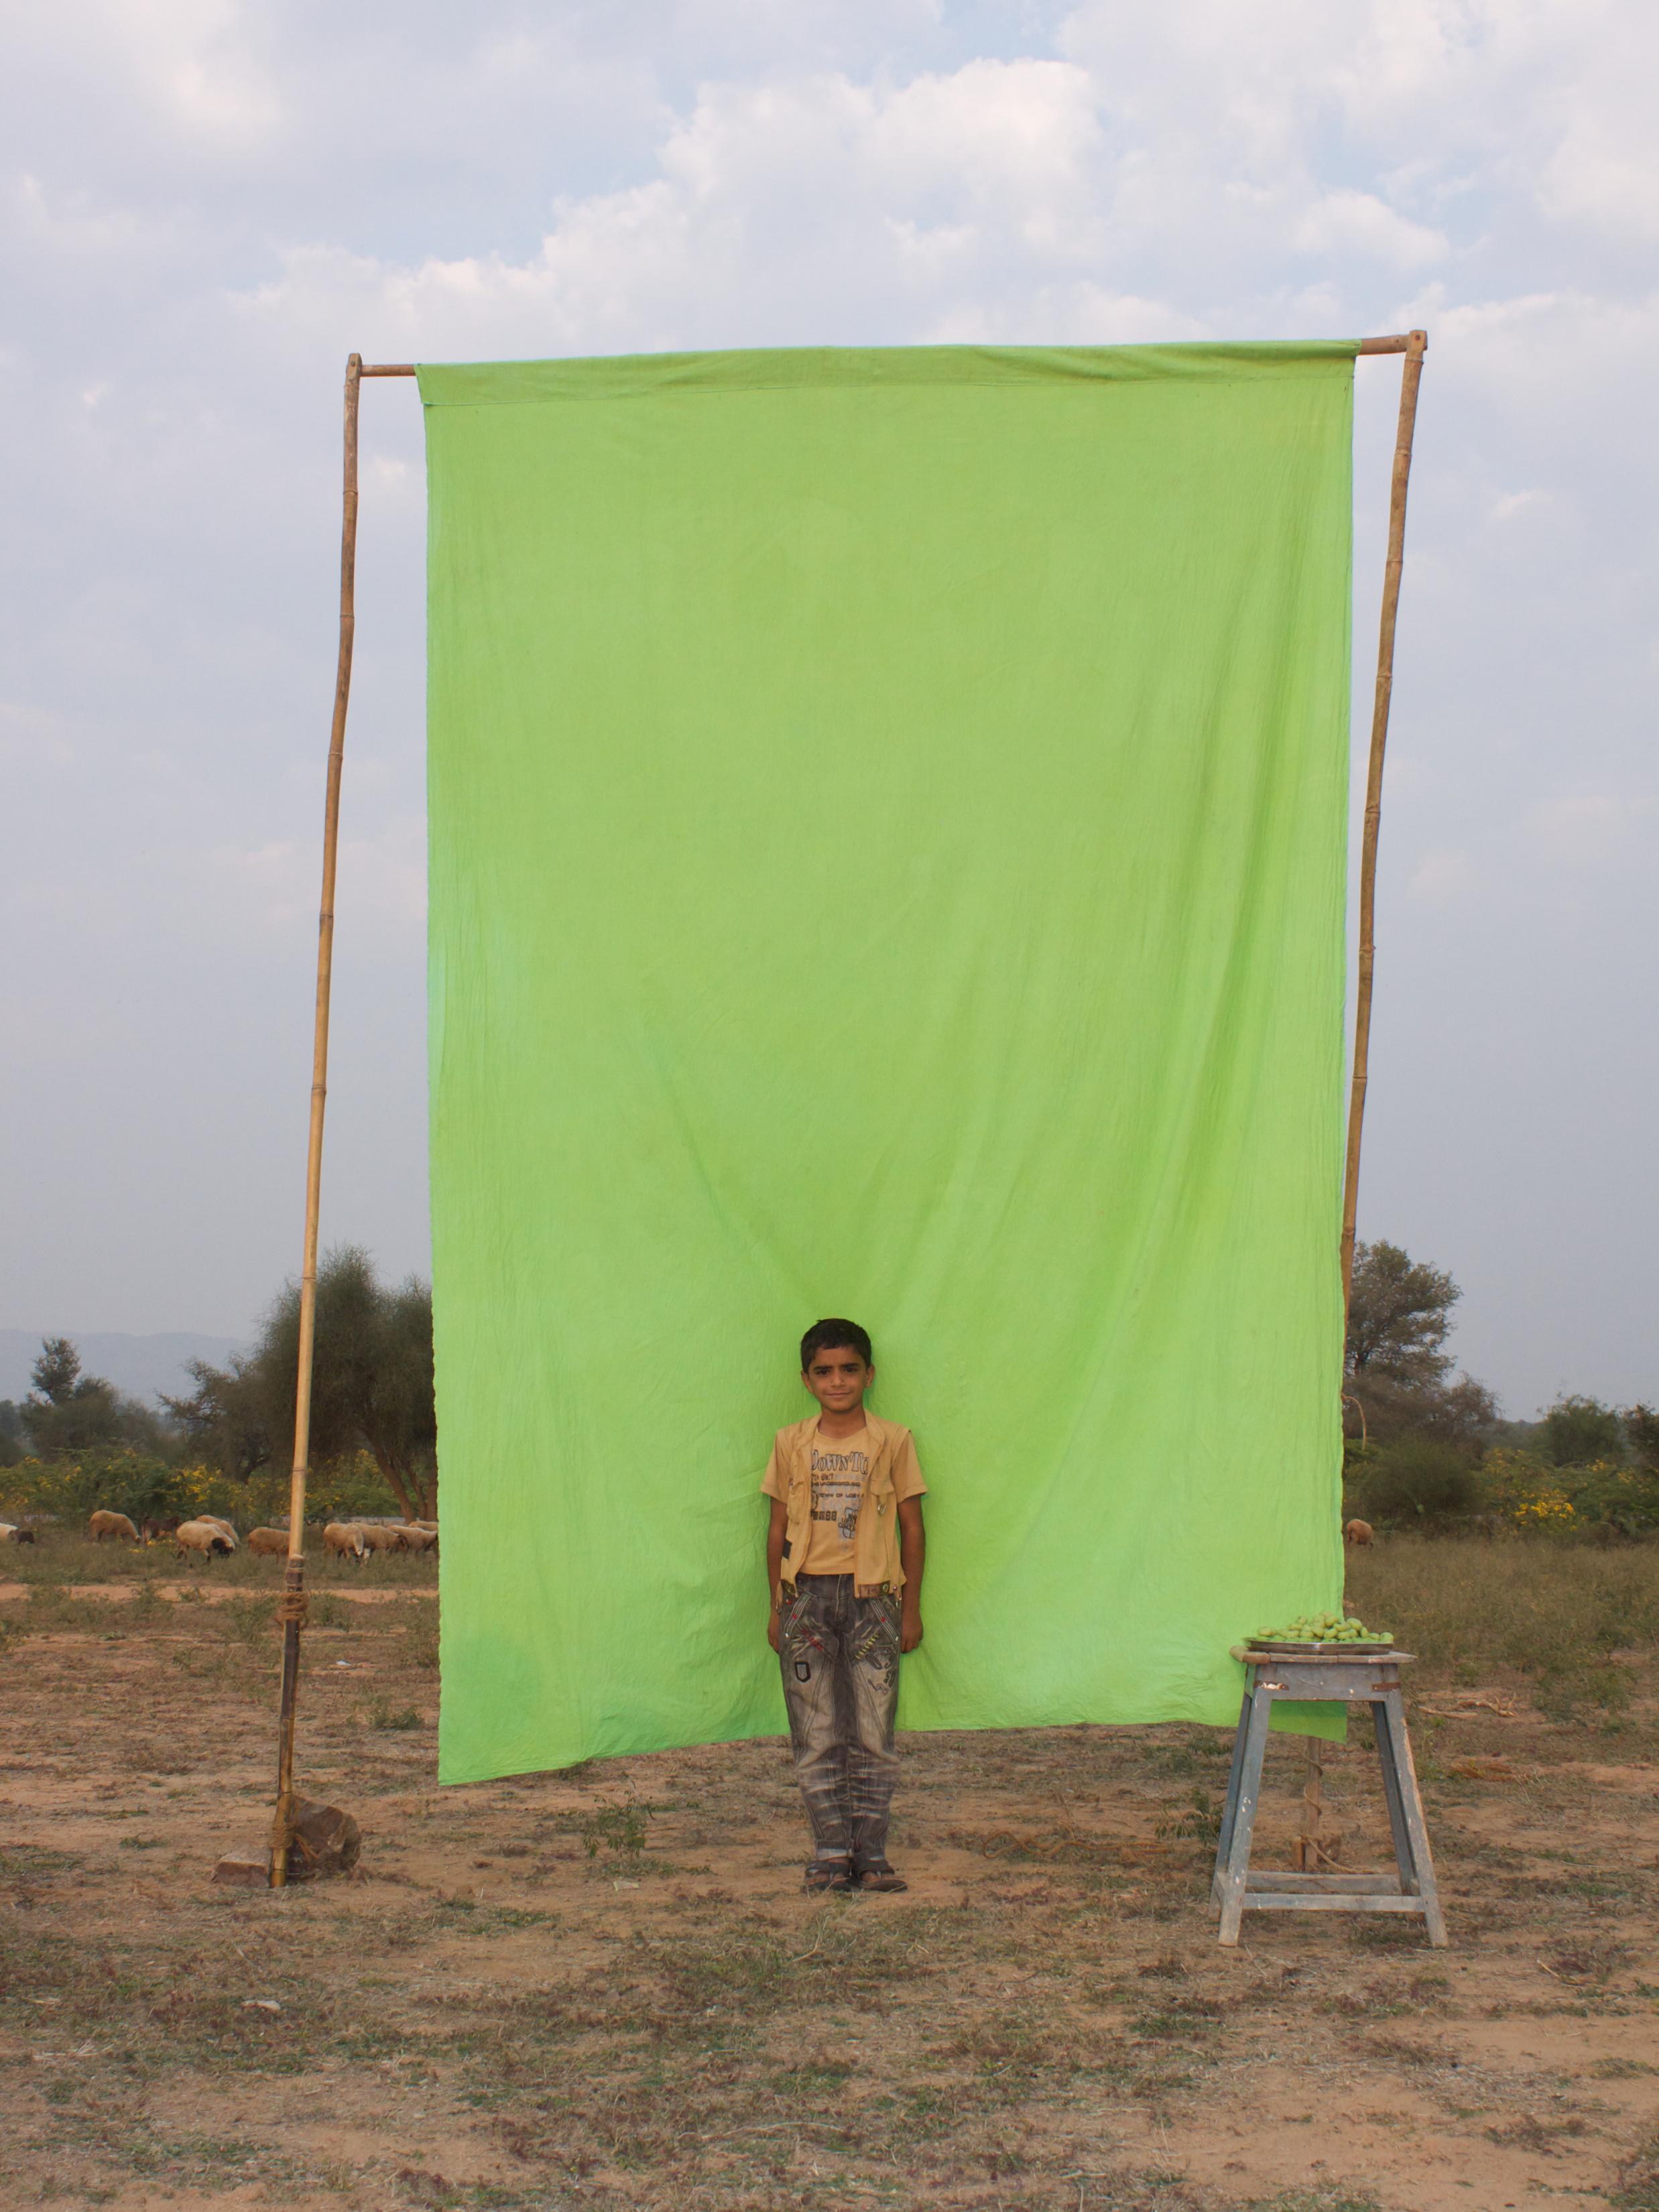 Benjamin Faga   Chroma Green No. 3    C-print    30 x 40 inches